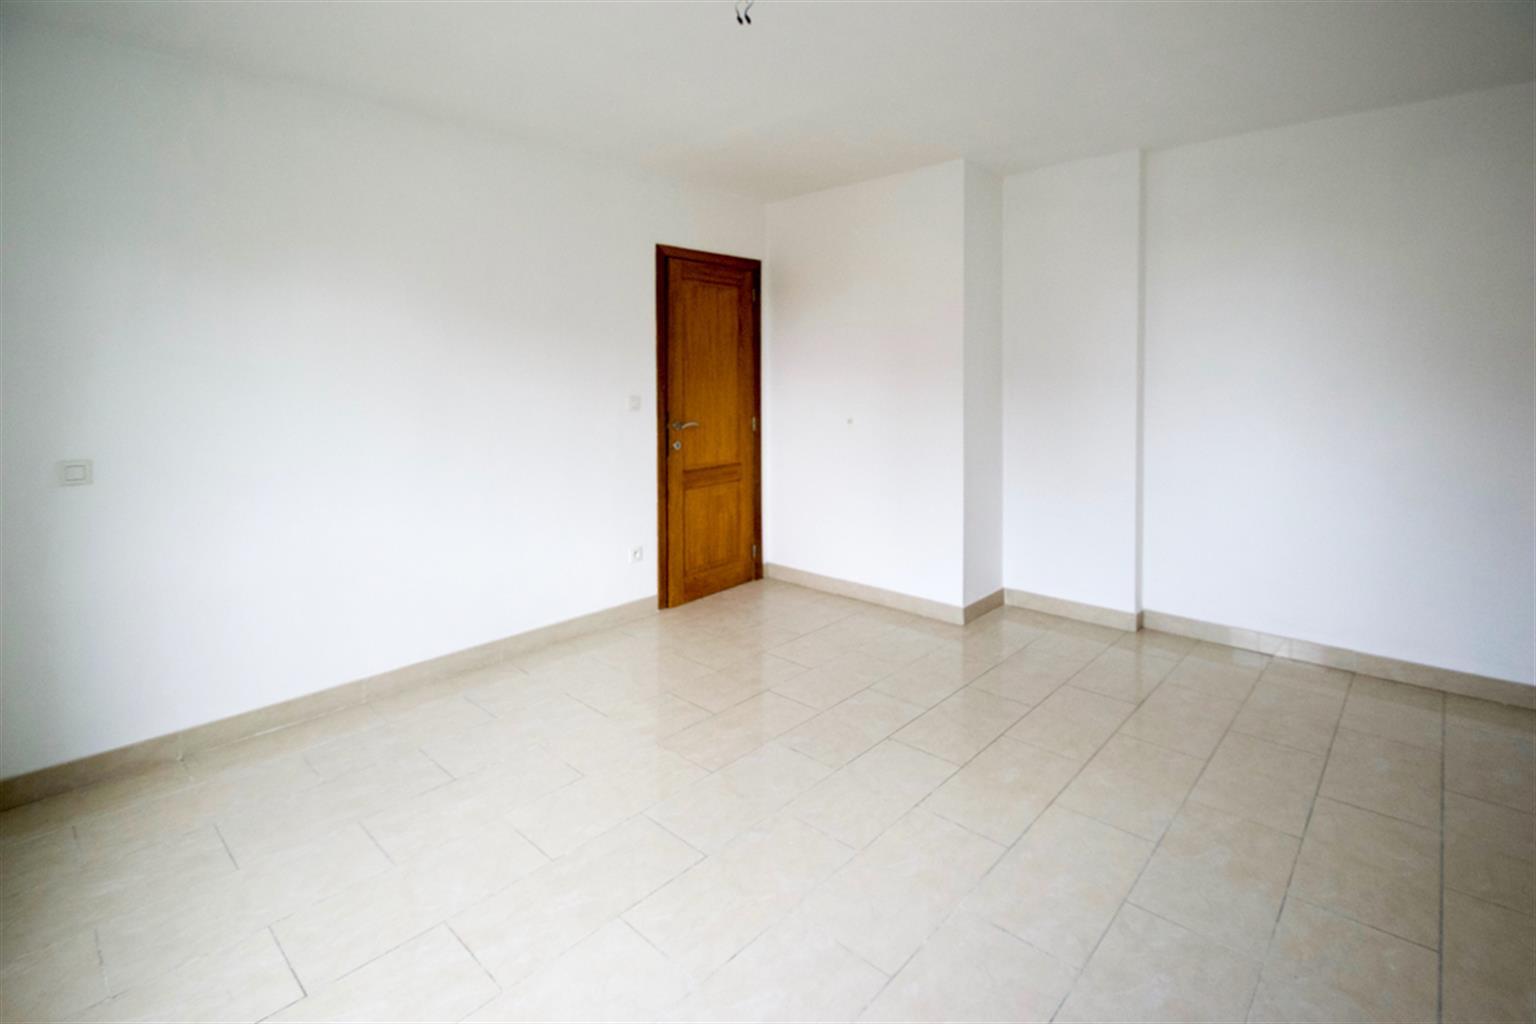 Appartement - Binche Leval-Trahegnies - #4172288-2